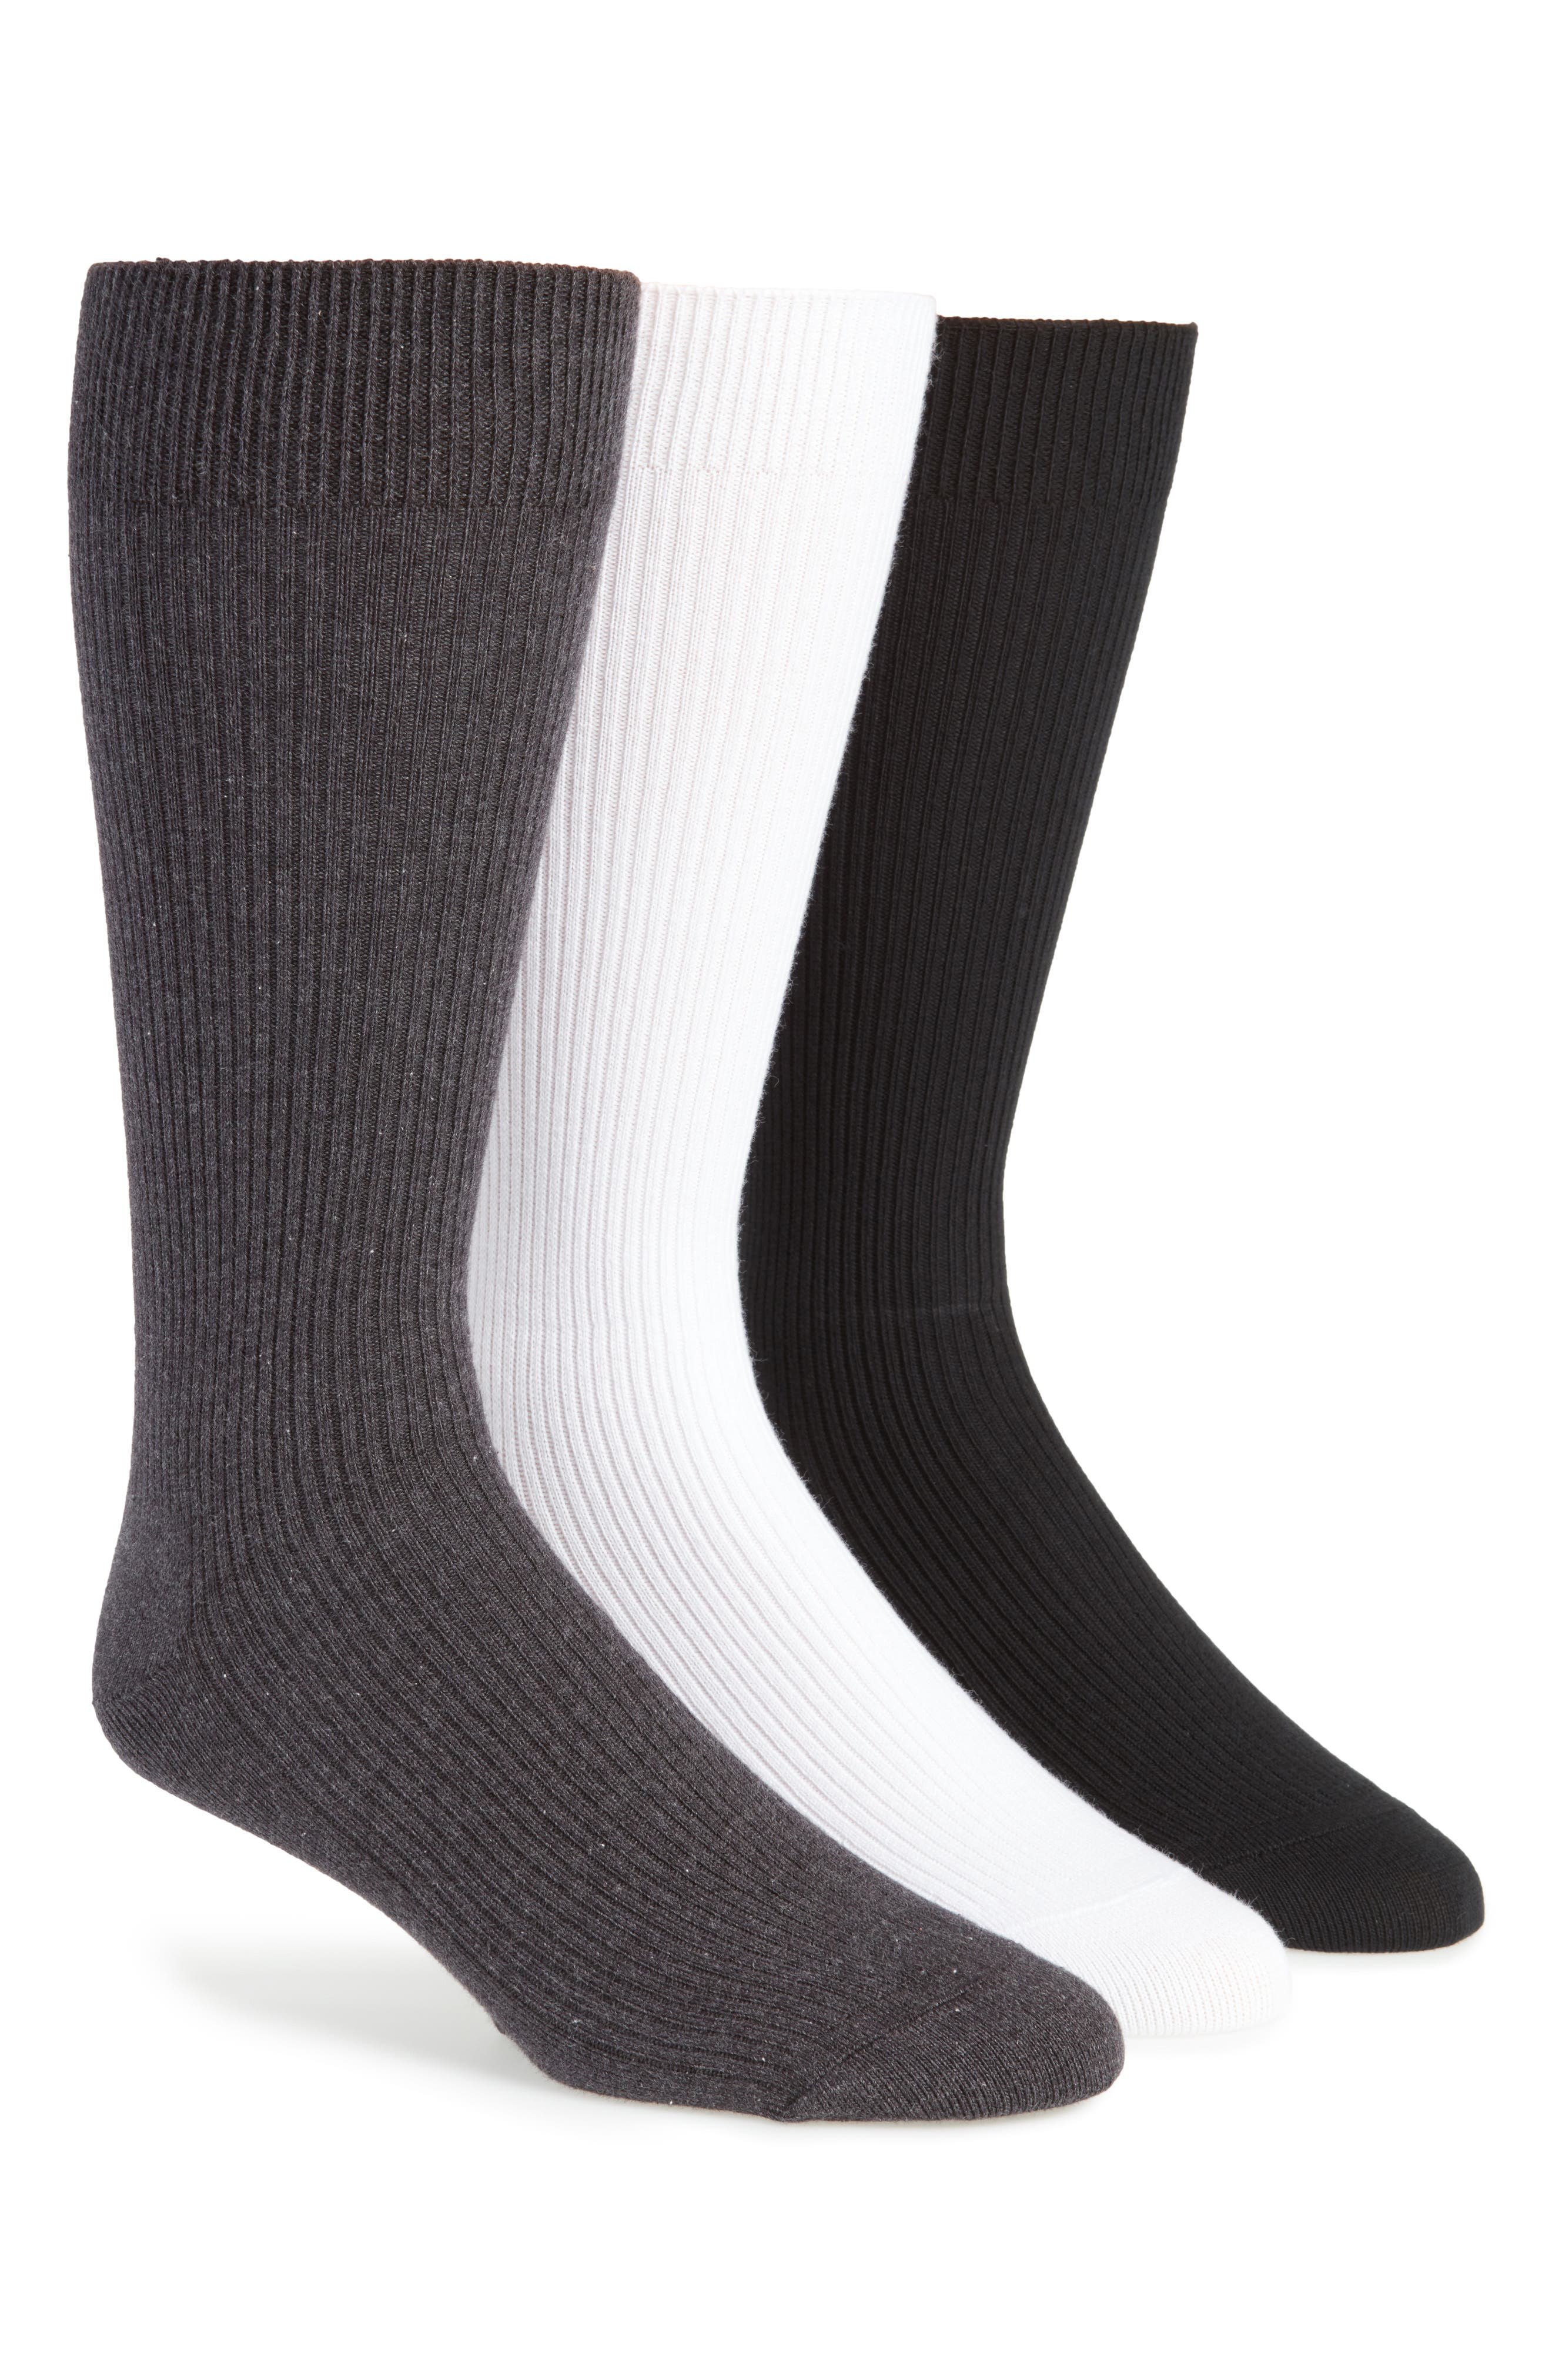 3-Pack Socks,                             Main thumbnail 1, color,